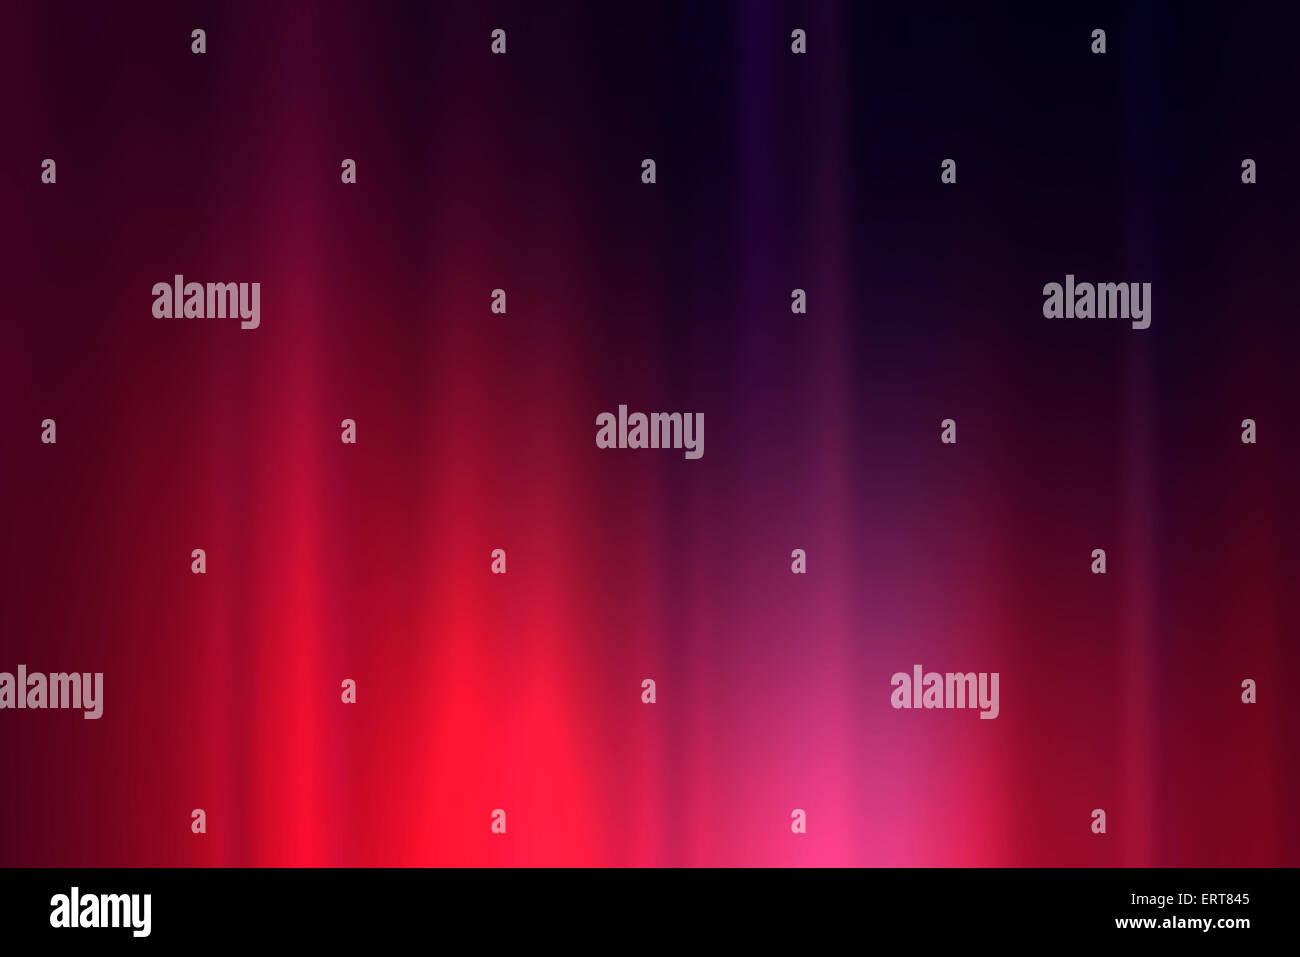 Motion Blur Effect for Background or Design Backdrop - Stock Image